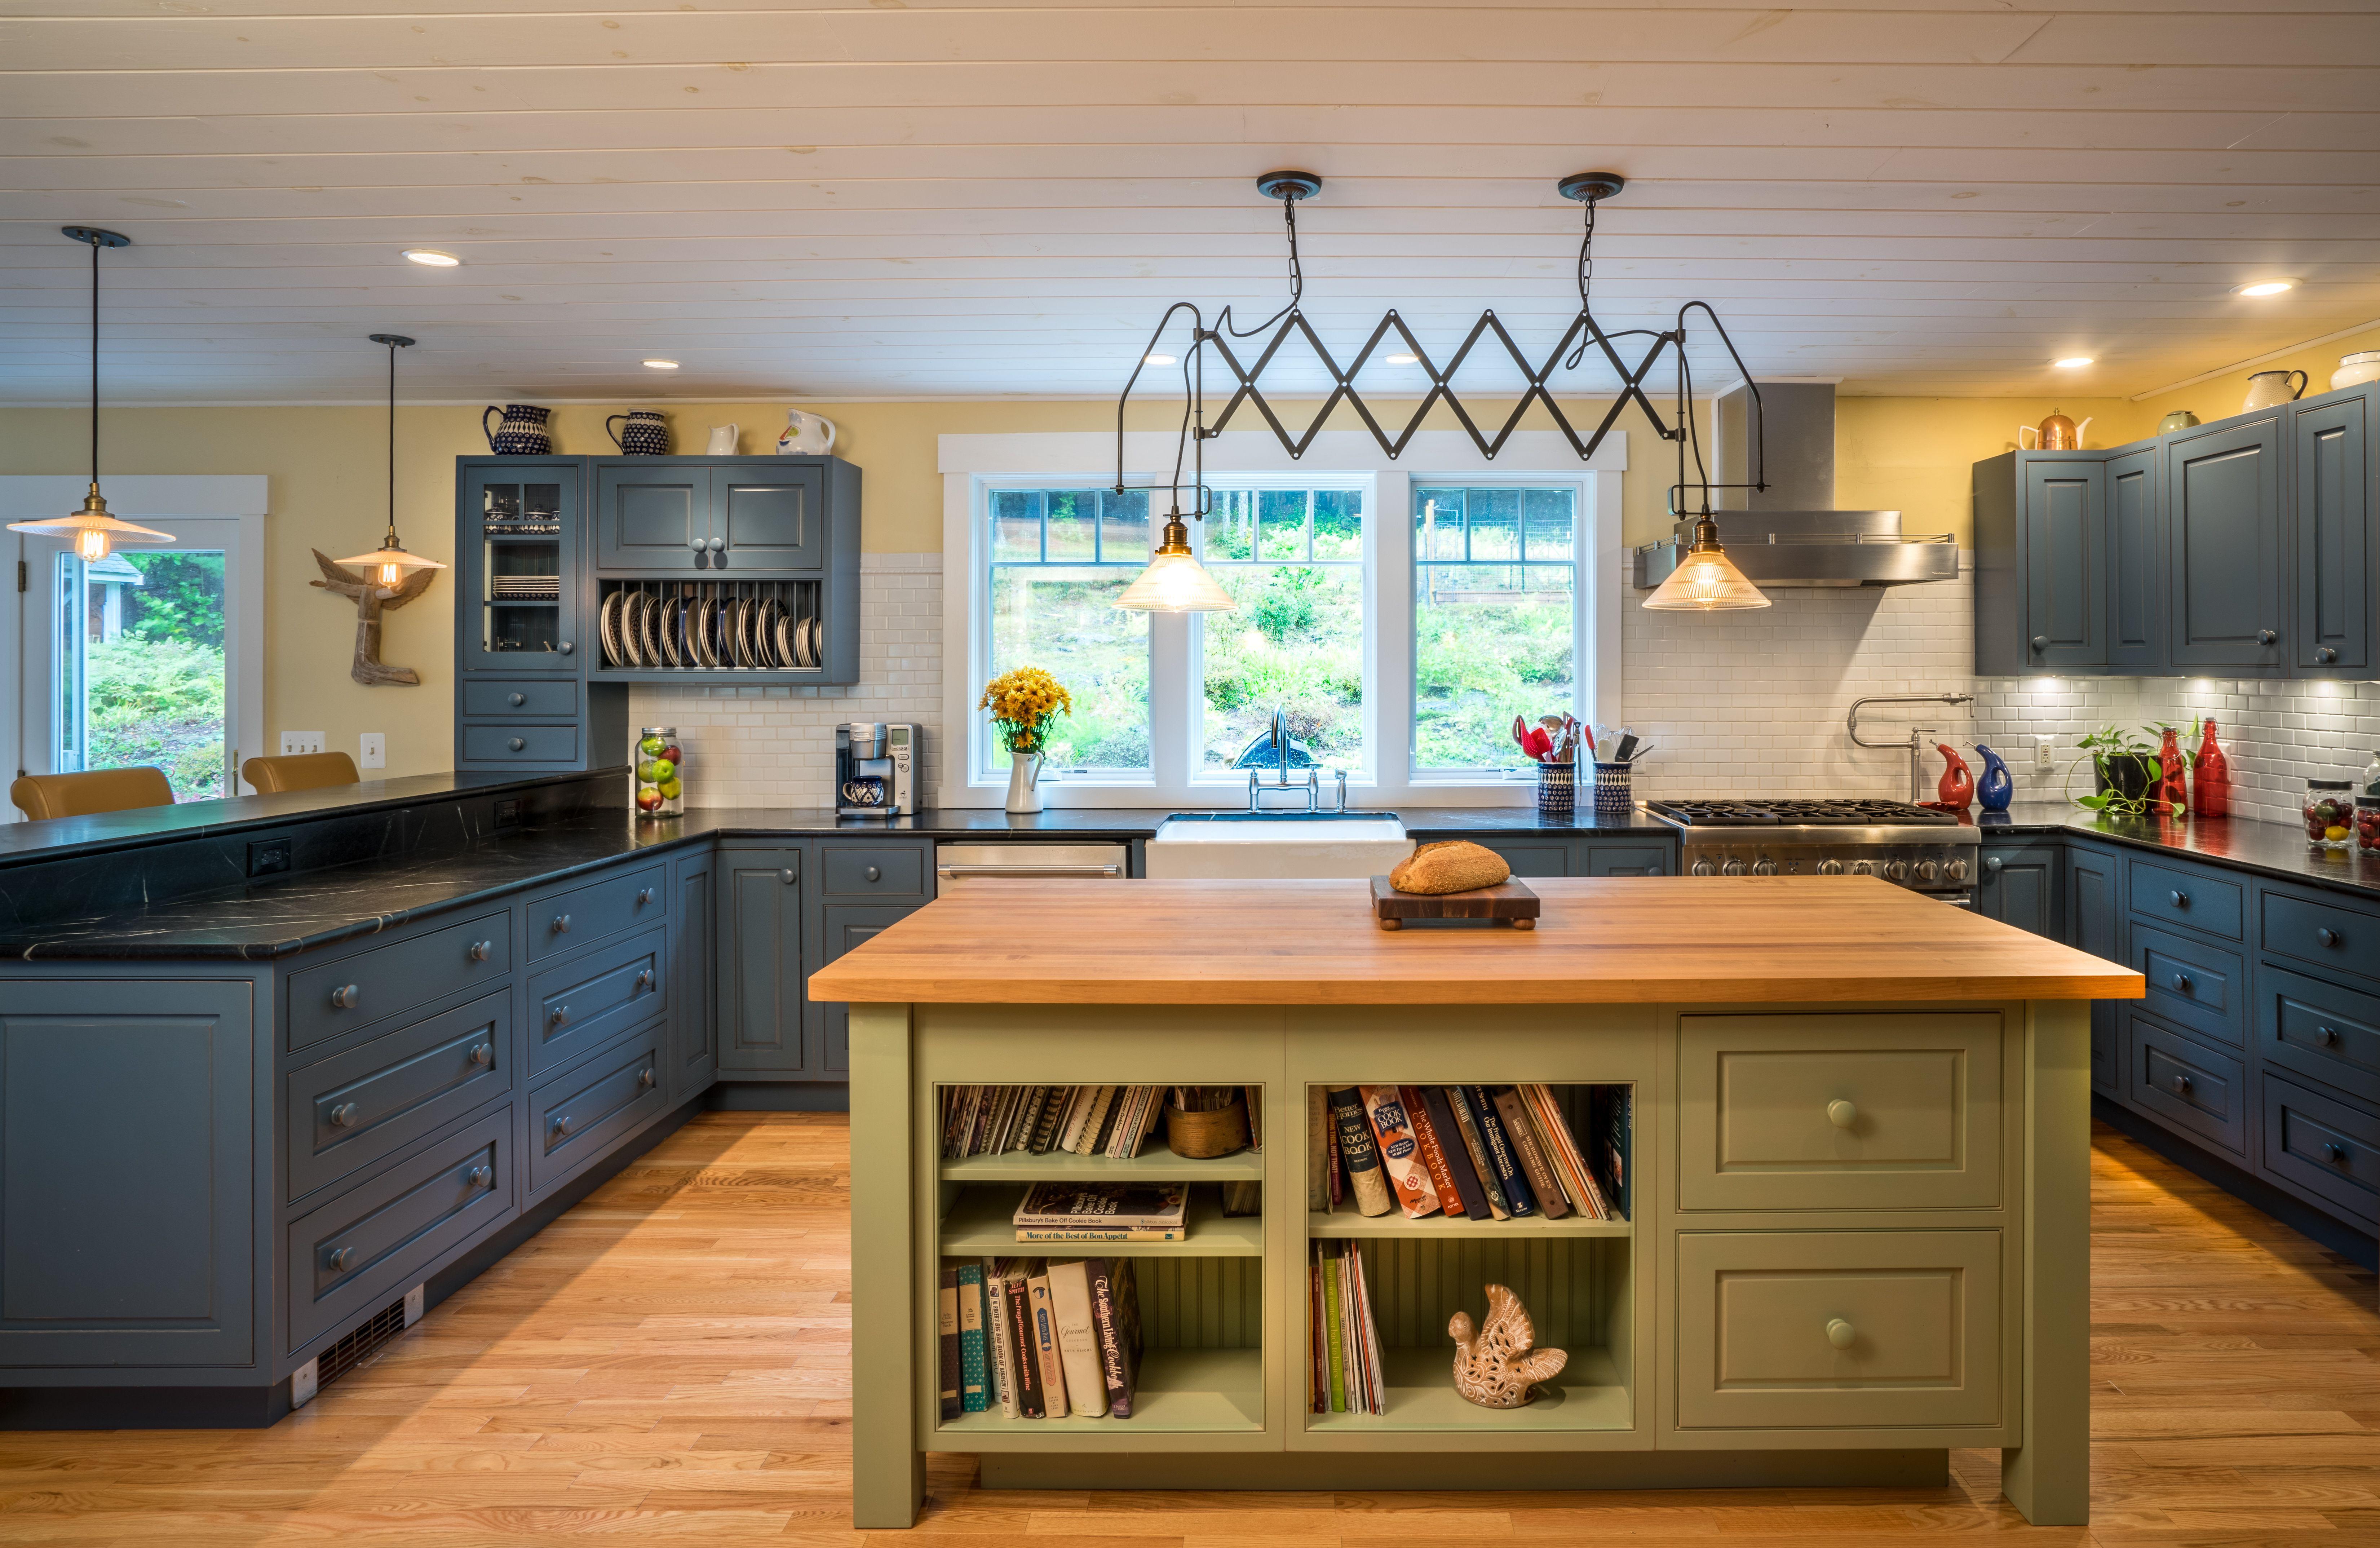 Pin By Hidup Sehat Dan Kesehatan On Www Kitchenworldinc Com Kitchen Inspirations Kitchen World Kitchen Countertops